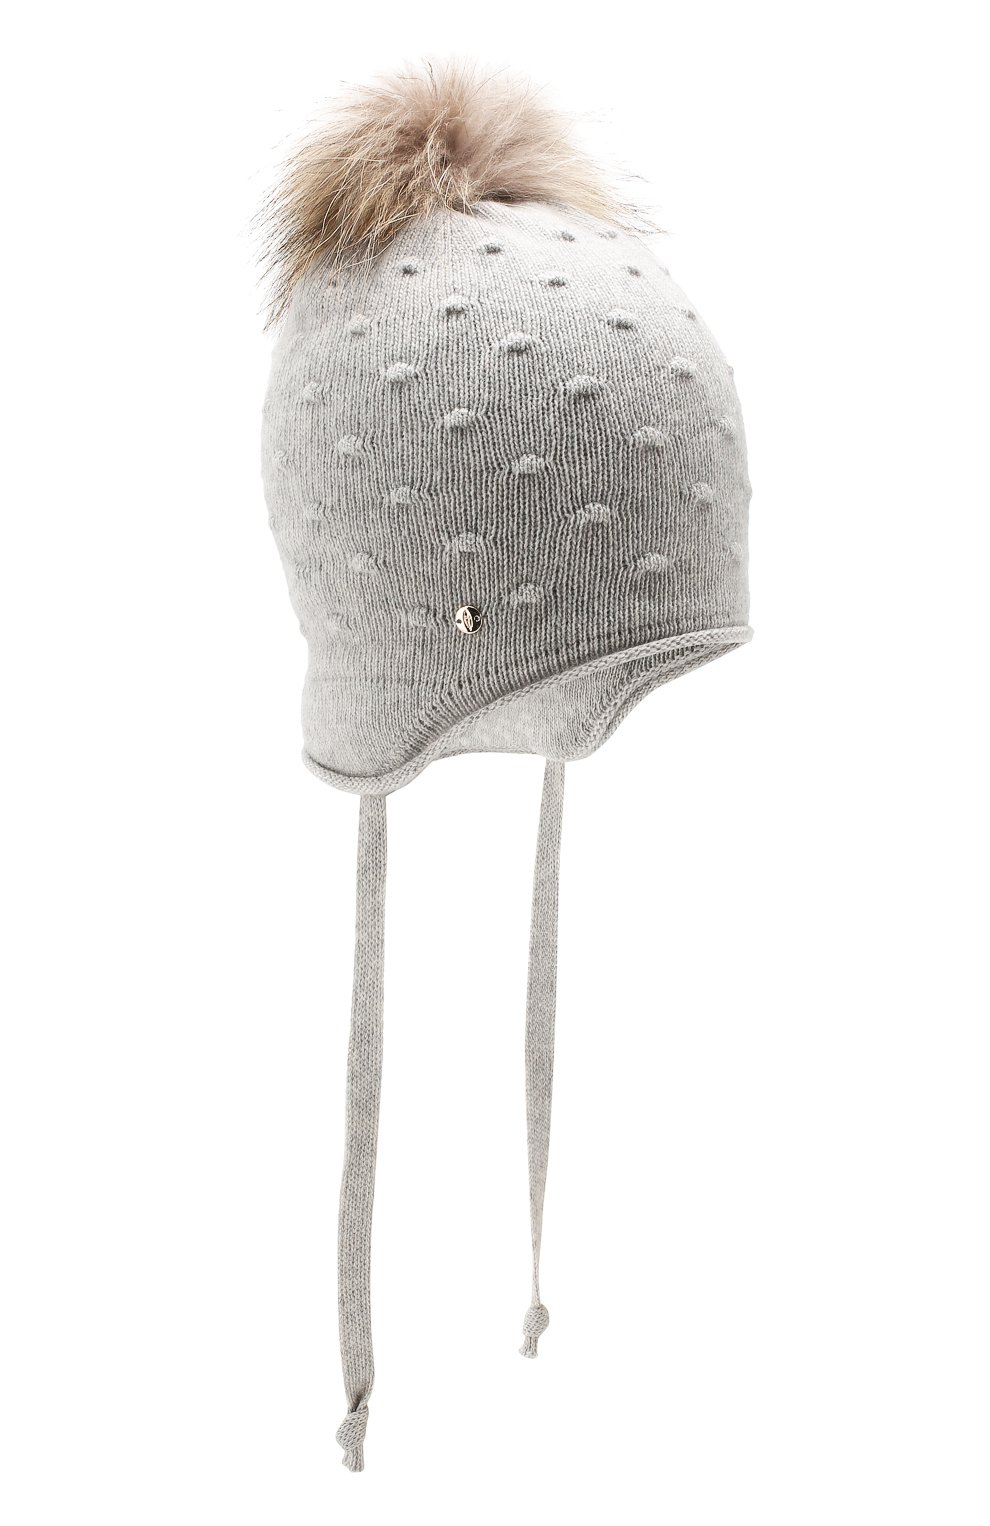 Детского шапка-ушанка bergamo CANOE светло-серого цвета, арт. 5914072.54 | Фото 1